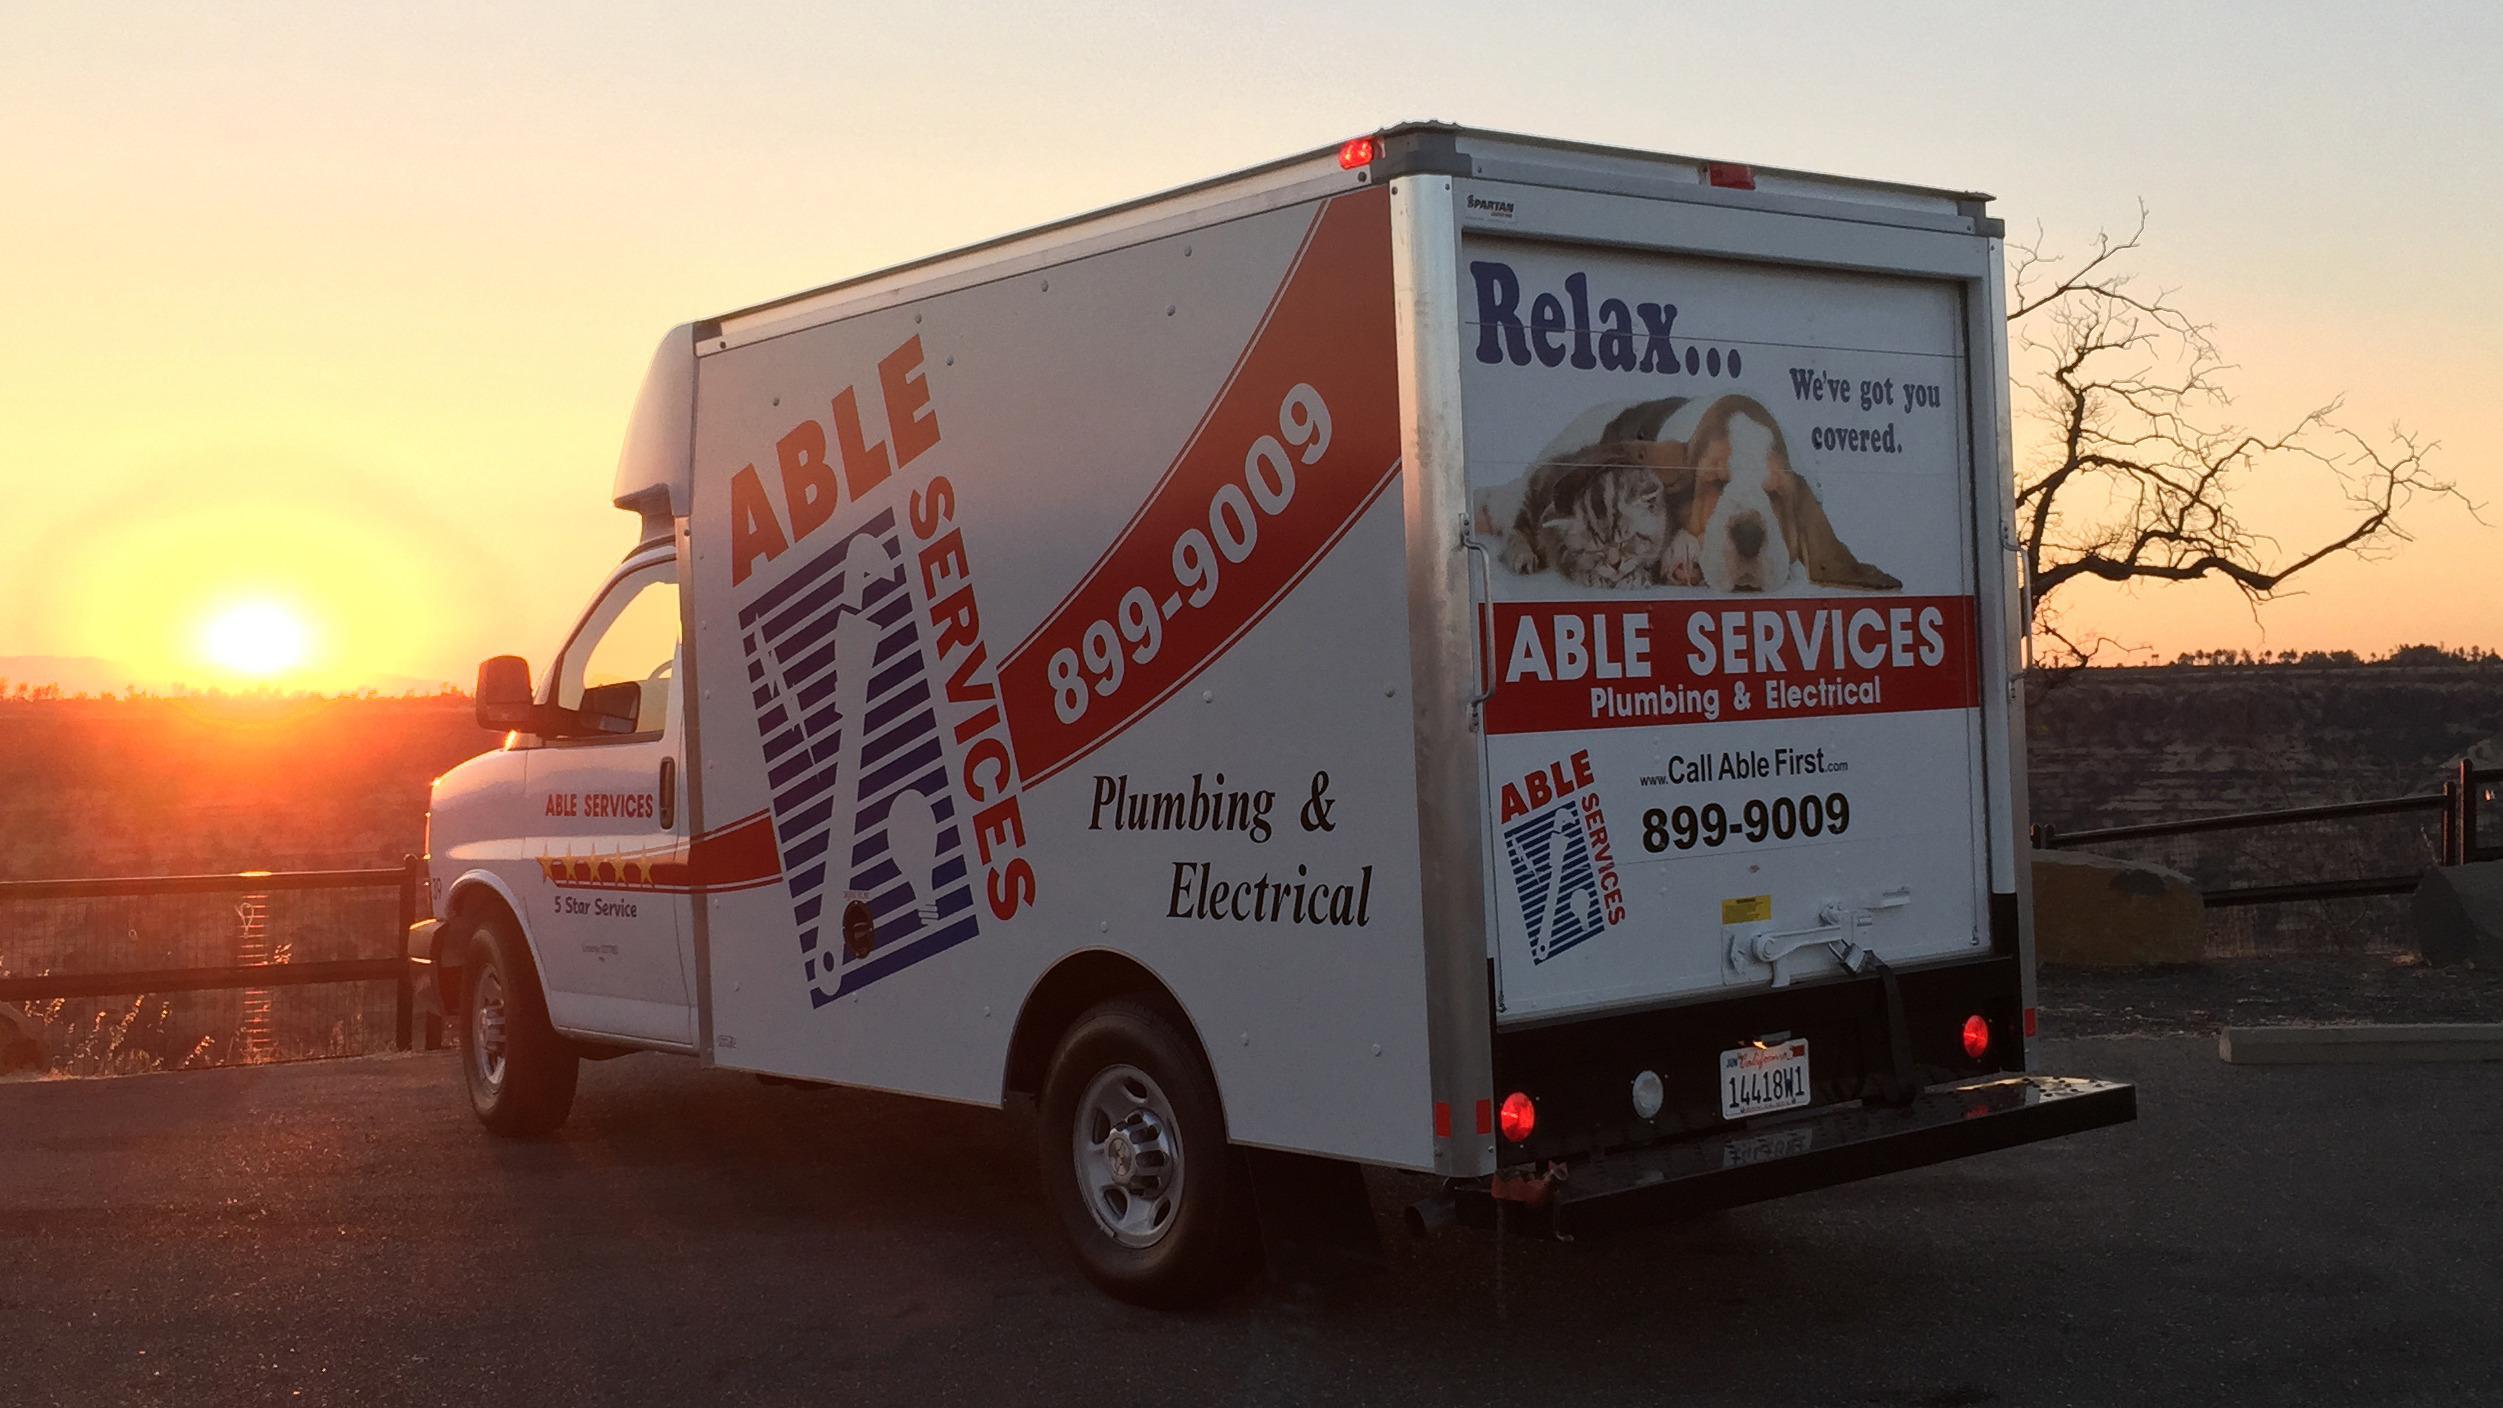 Able Plumbing & Electrical image 0